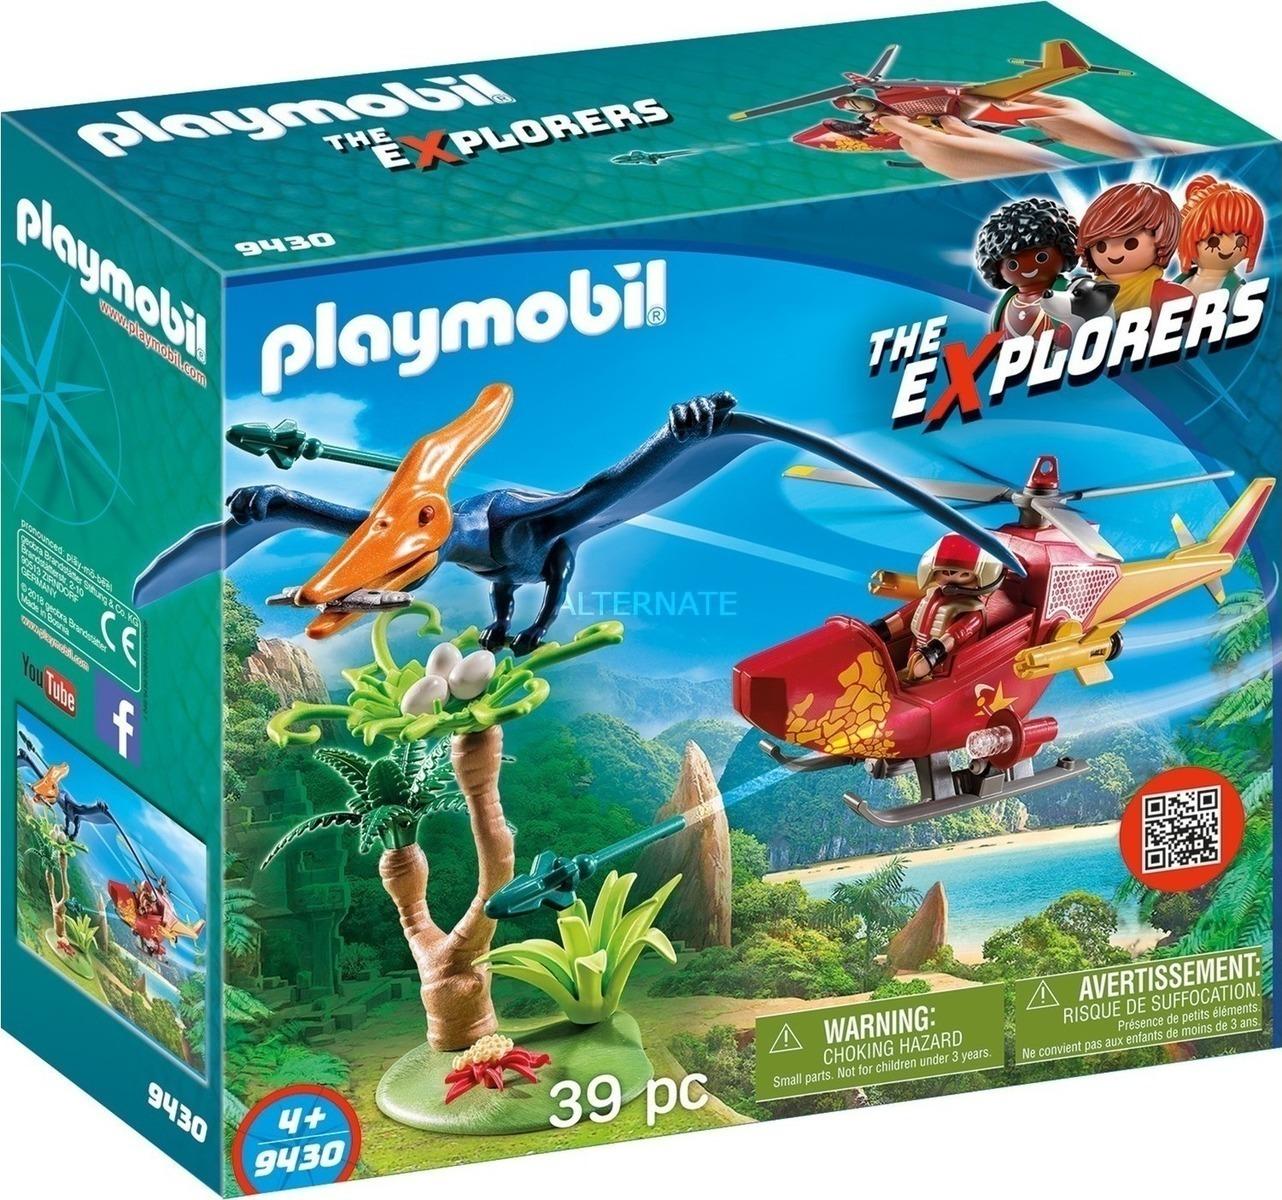 Playmobil The Explorers: Ελικόπτερο και Πτεροδάκτυλος 9430